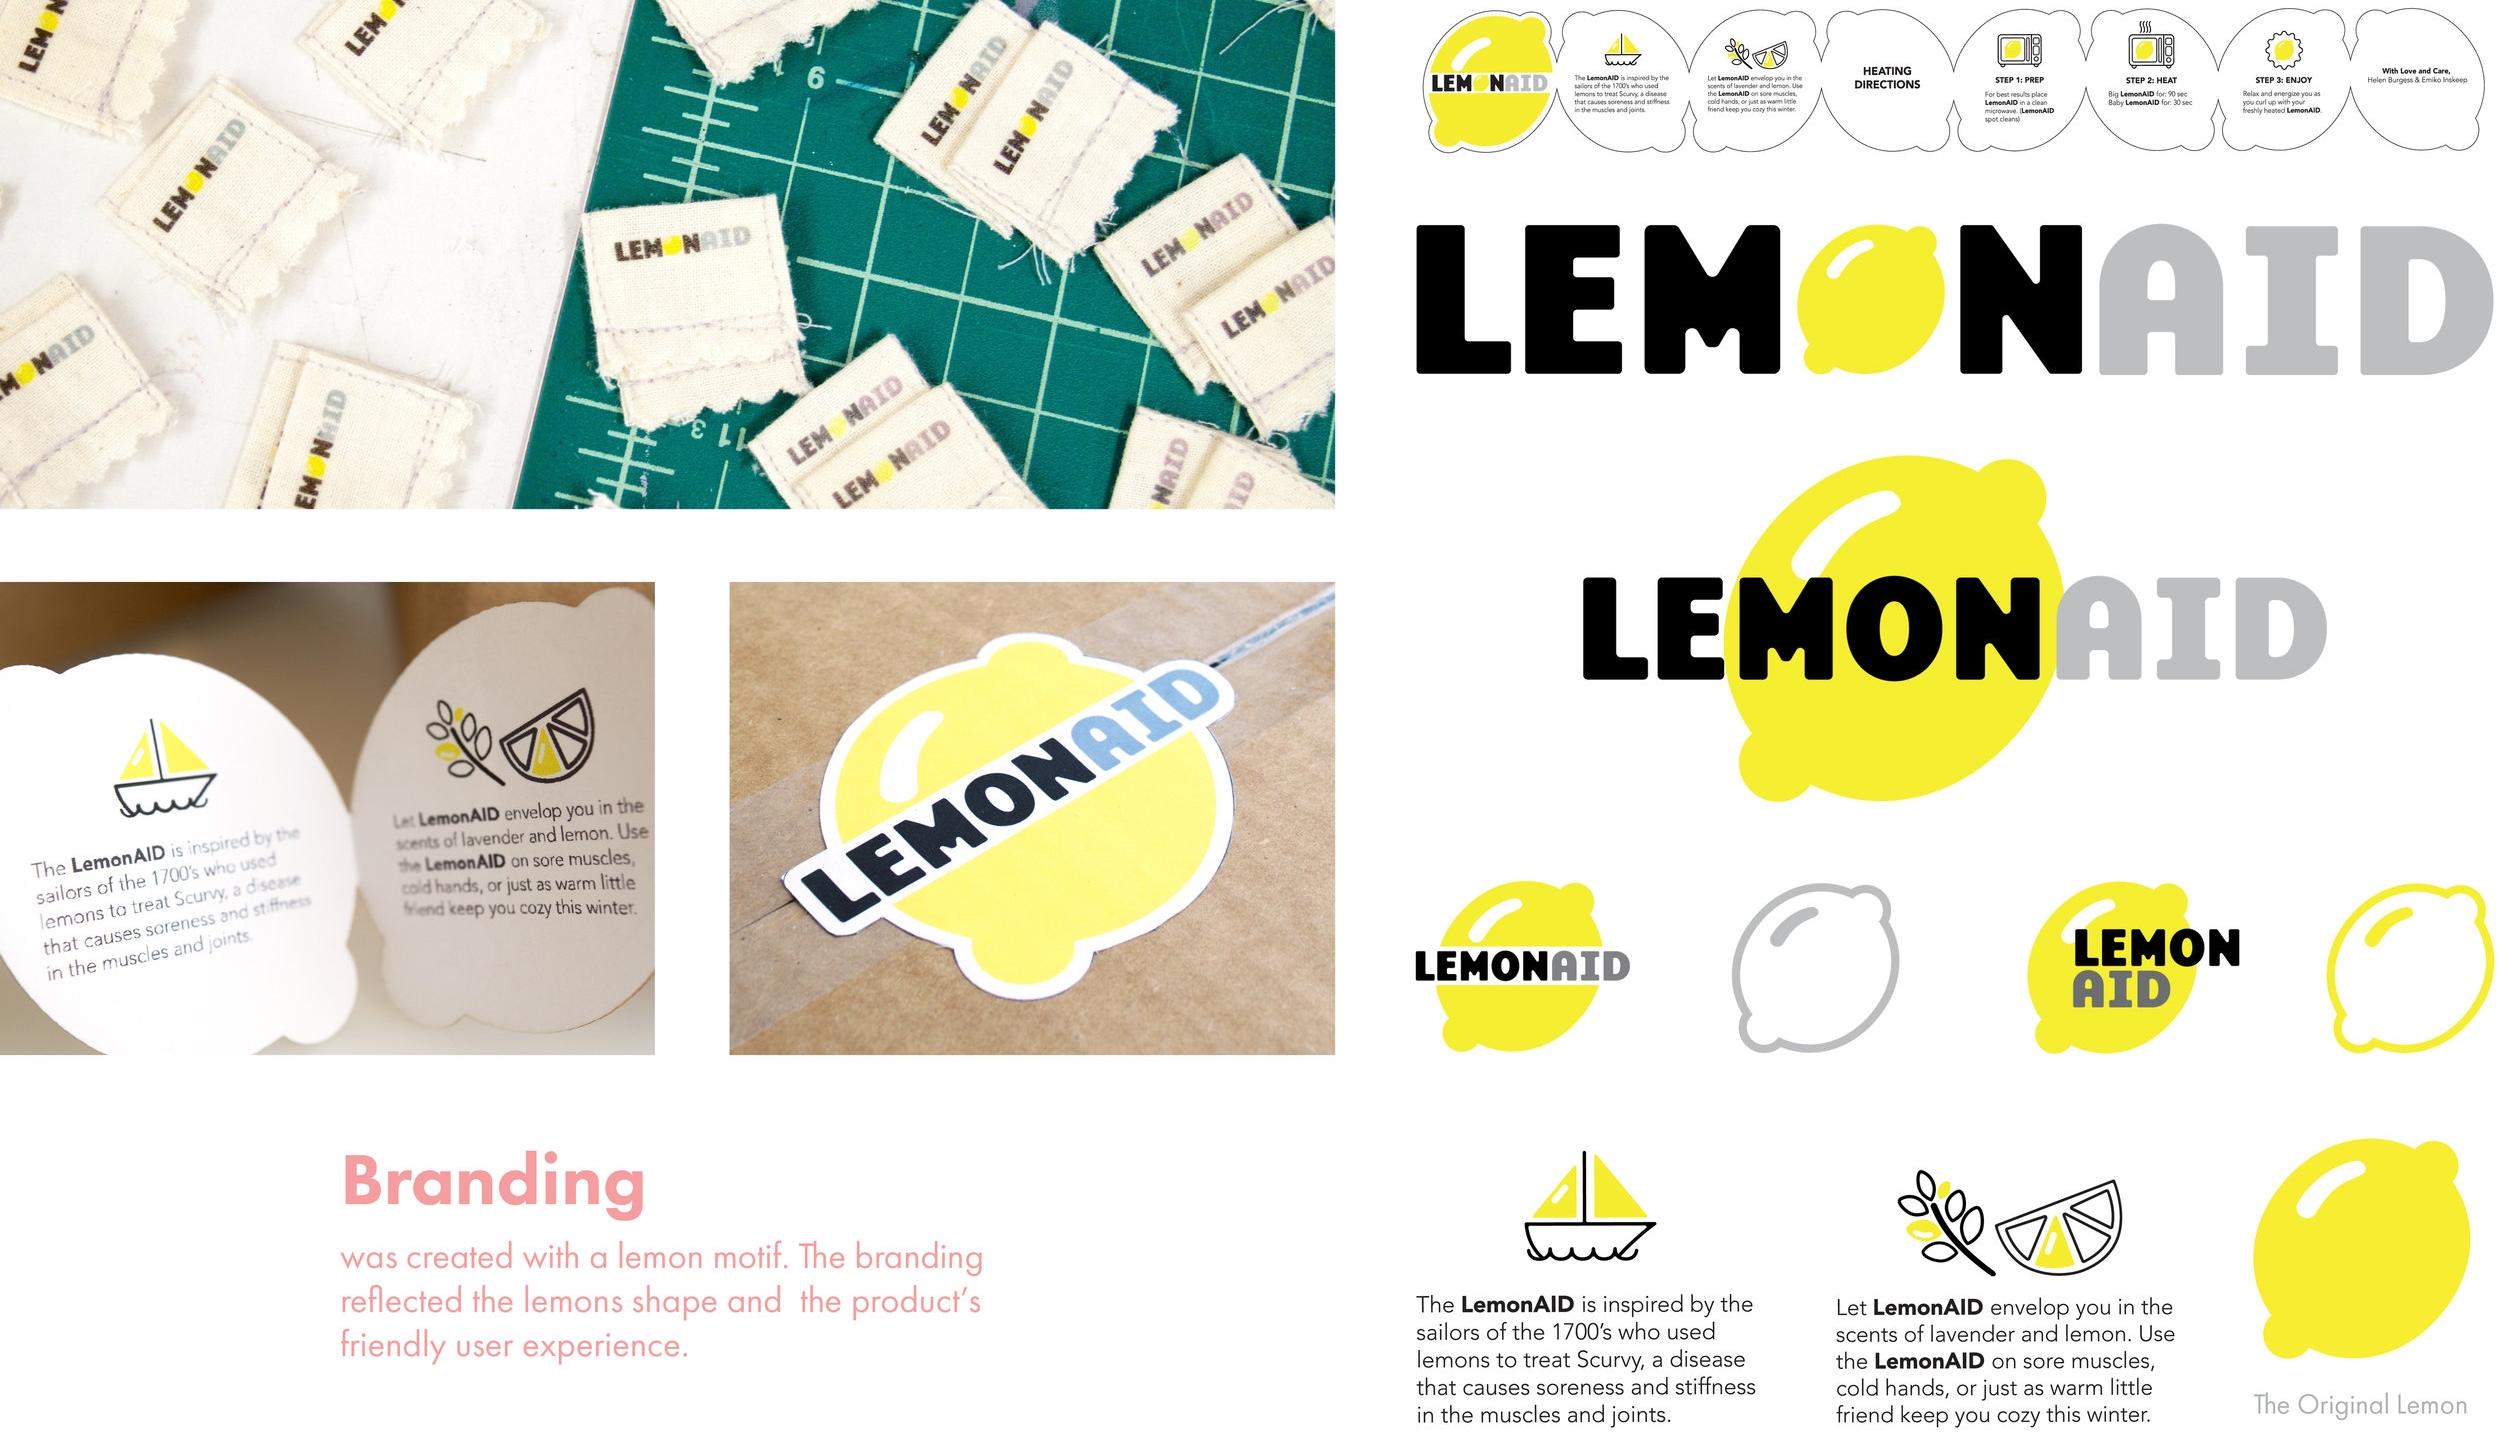 LemonaidText1 overlay.jpg